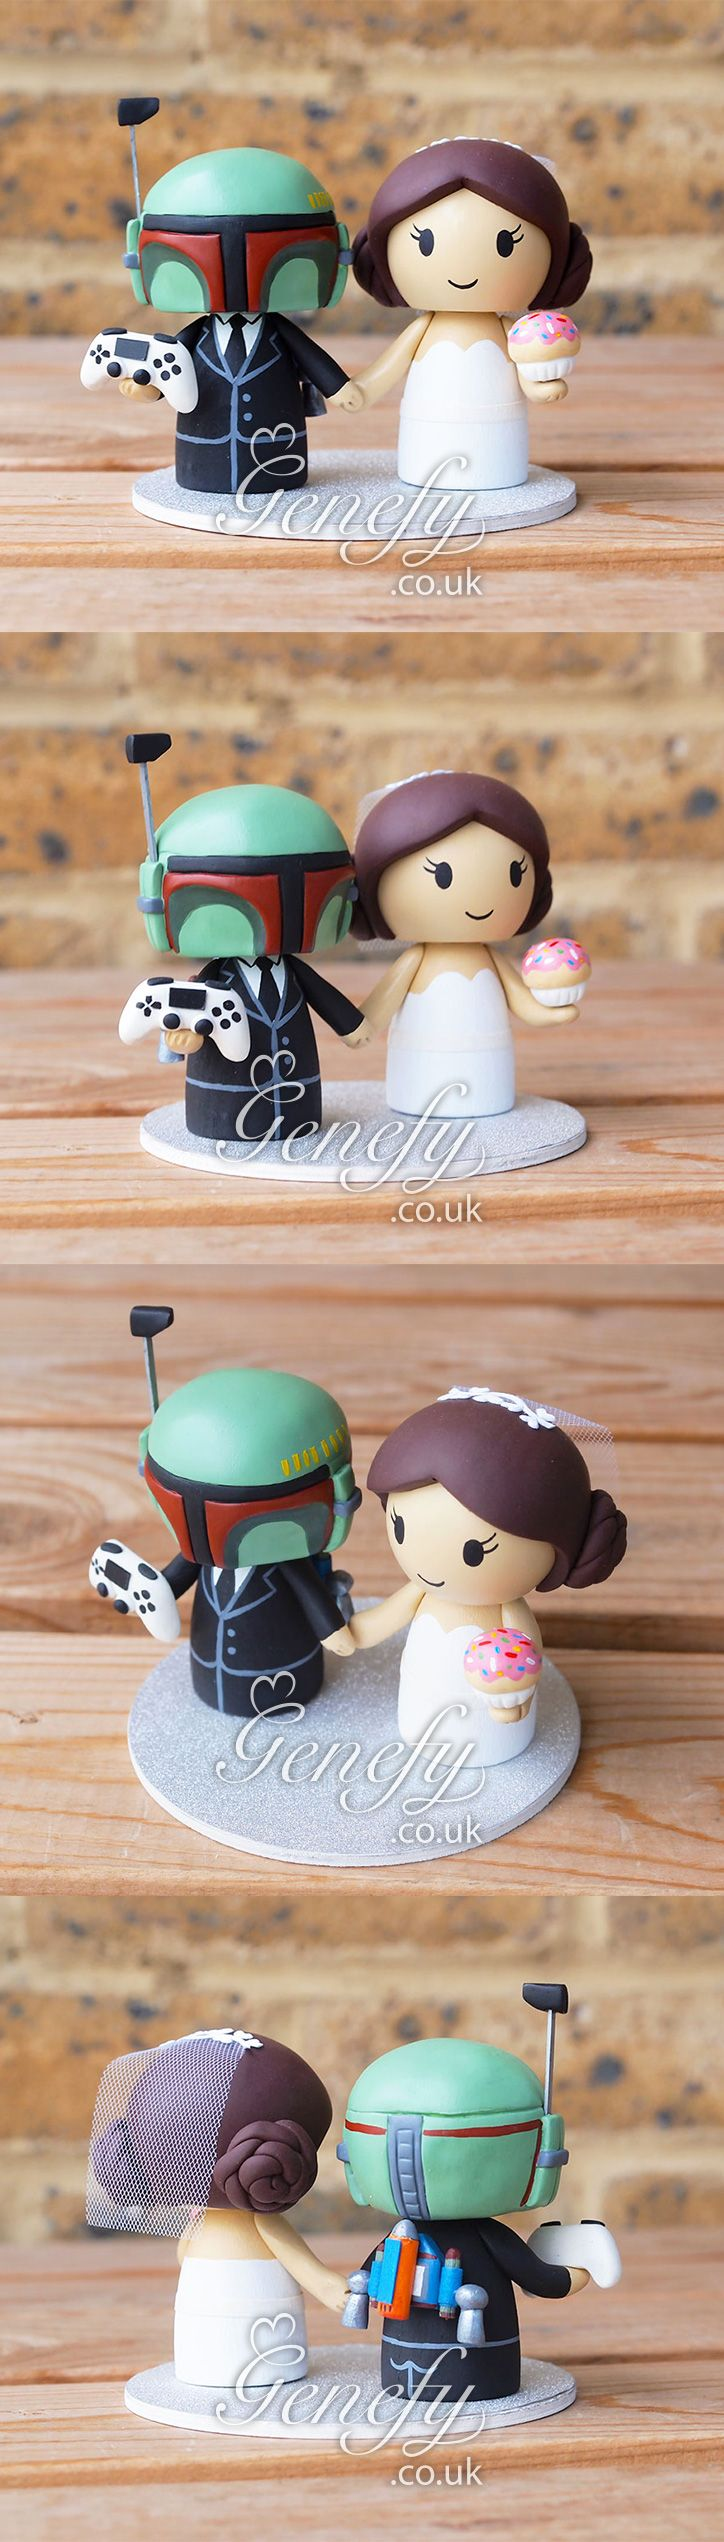 Boba Fett with jetpack wedding cake topper by Genefy Playground  https://www.facebook.com/genefyplayground